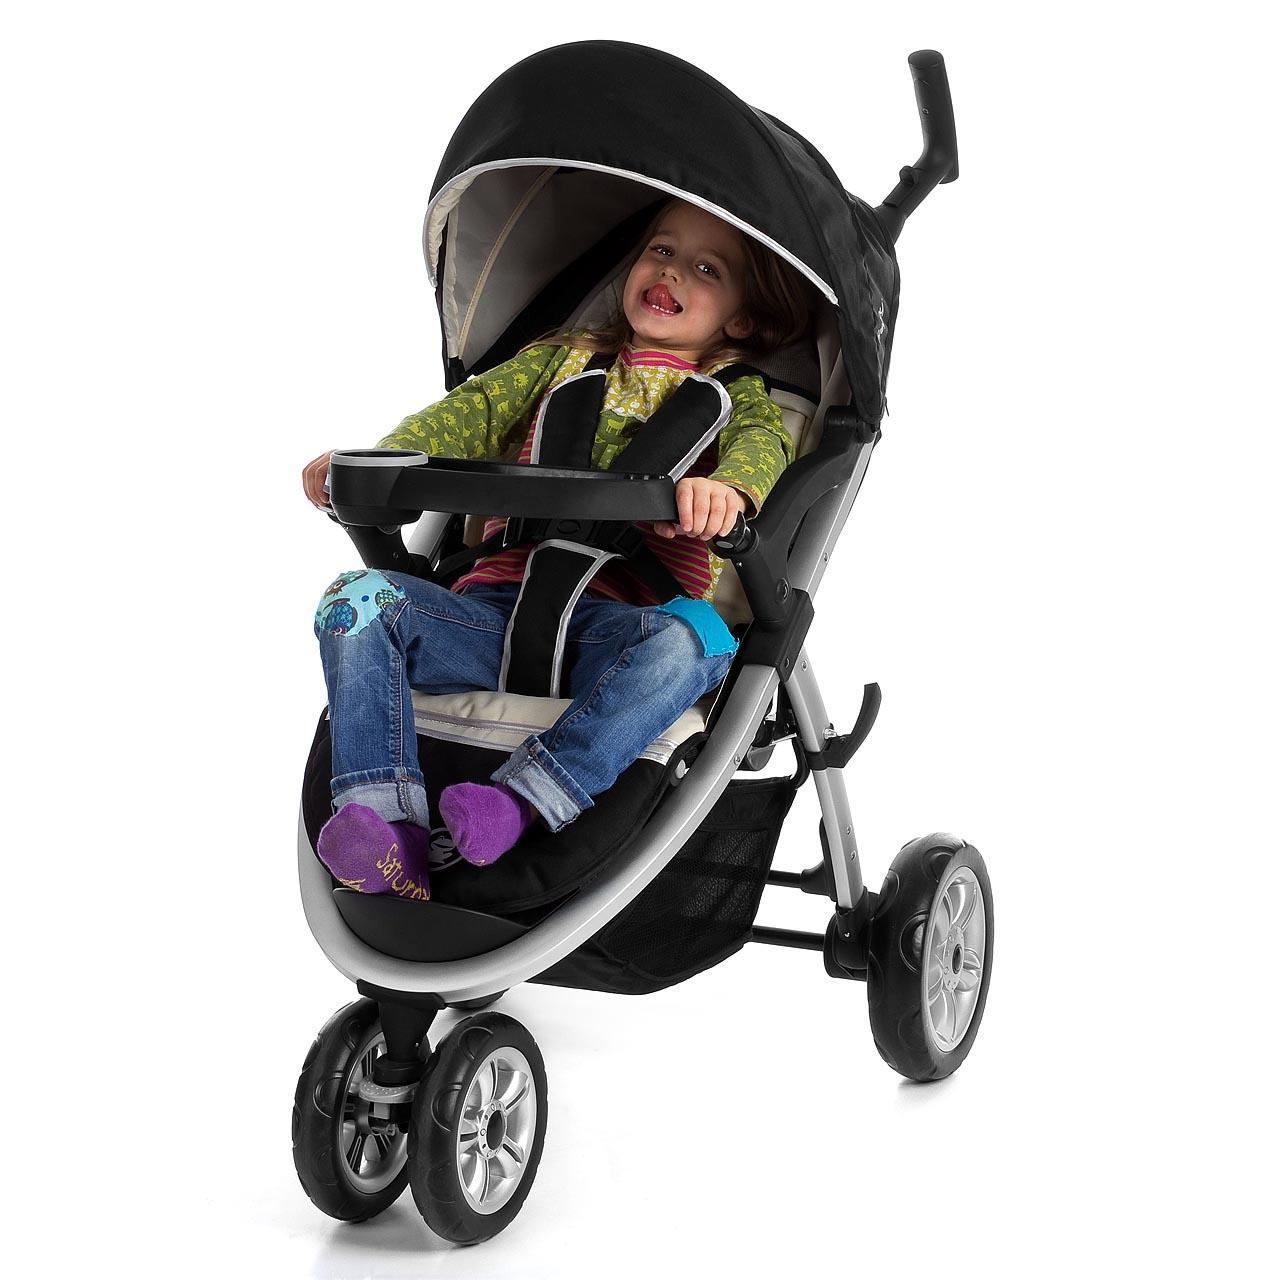 froggy citybug safari pram child stroller pushchair buggy foldable ebay. Black Bedroom Furniture Sets. Home Design Ideas